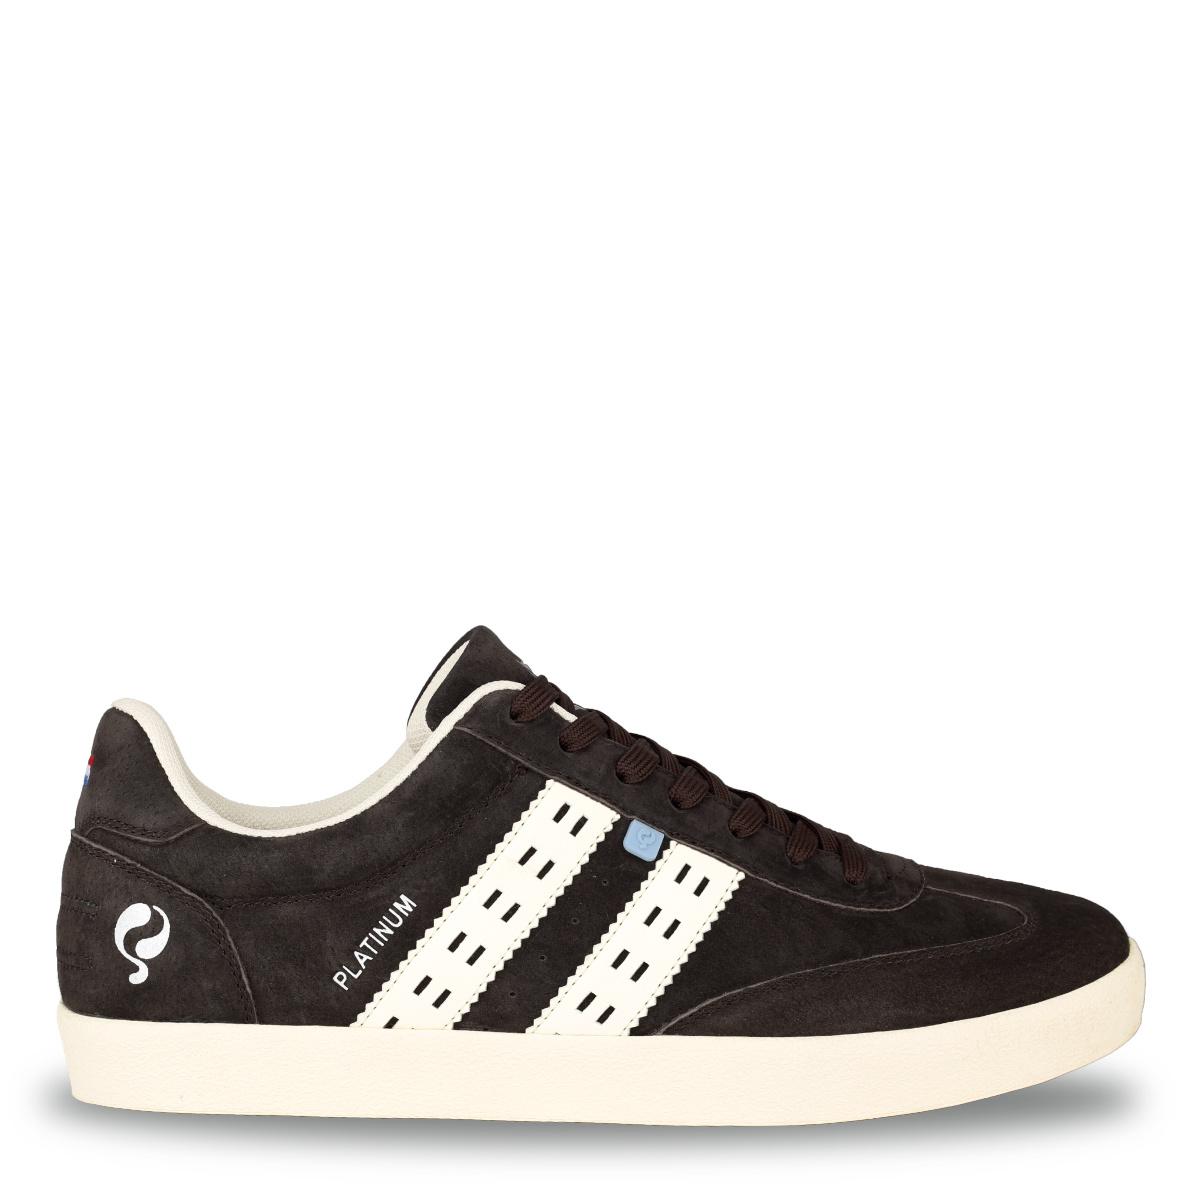 Heren Sneaker Platinum - Donkerbruin/Crème